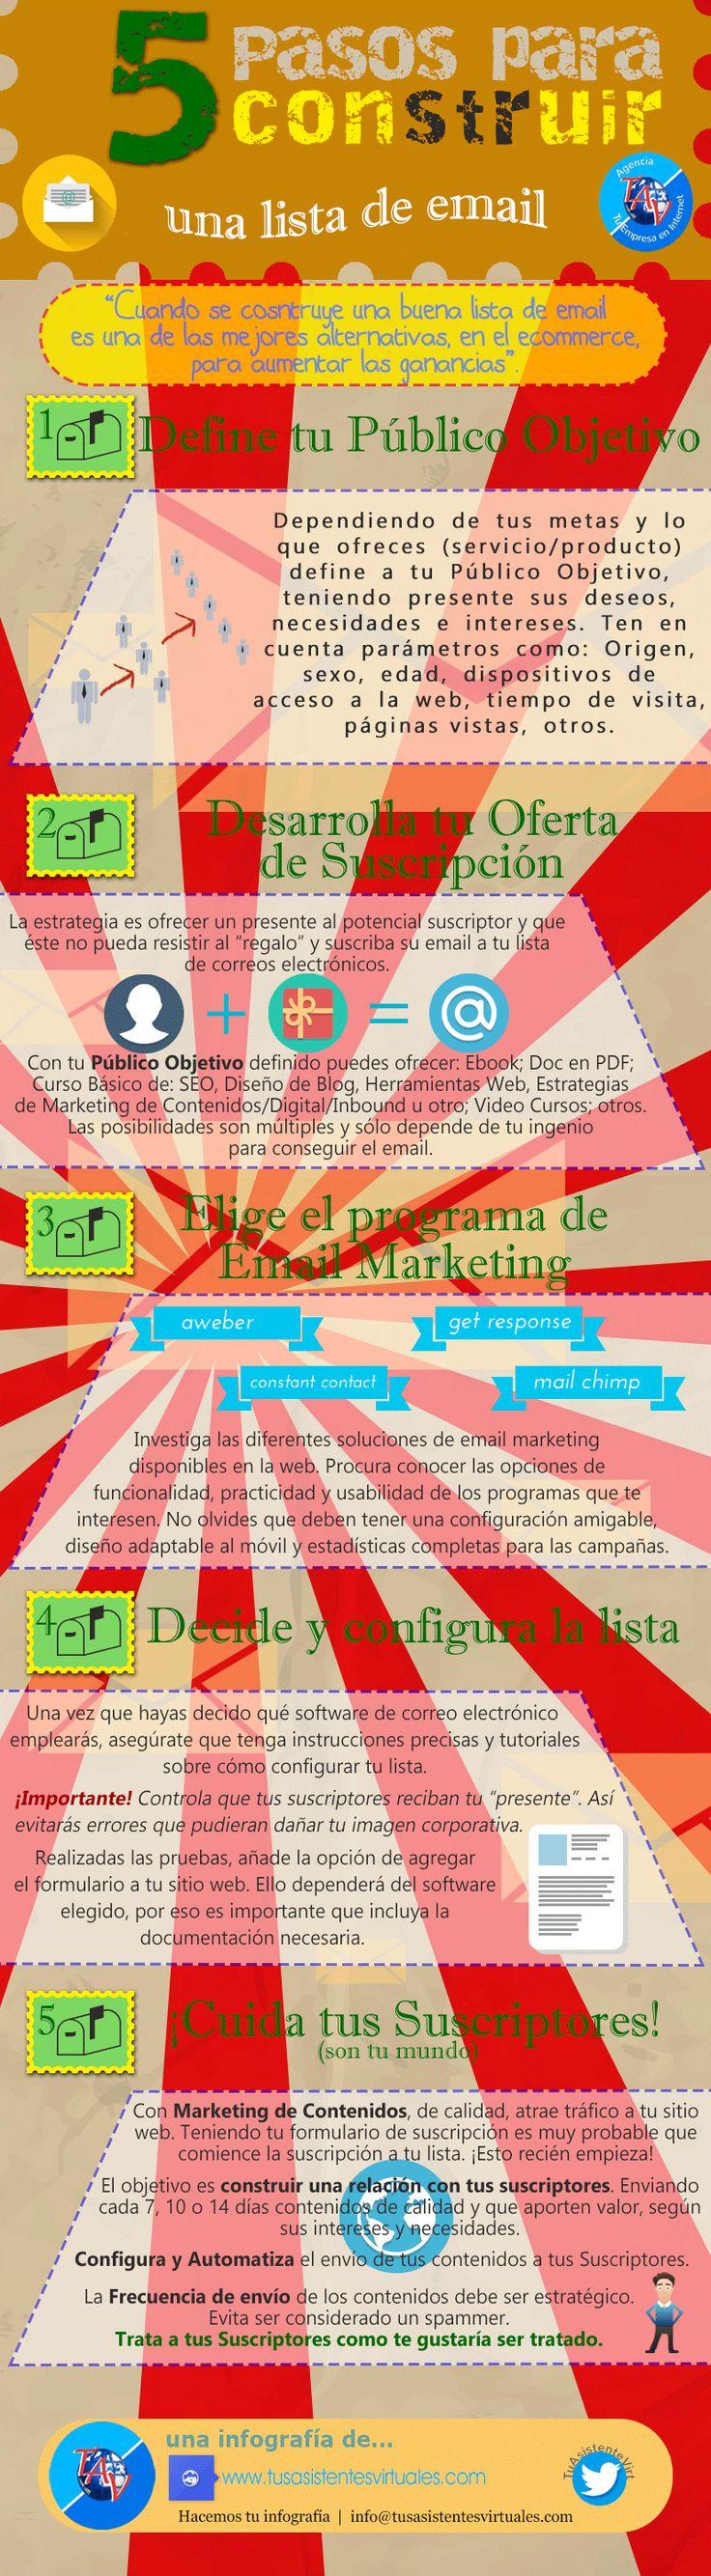 5 pasos para crear un lista de email marketing #infografia #infographic #marketing